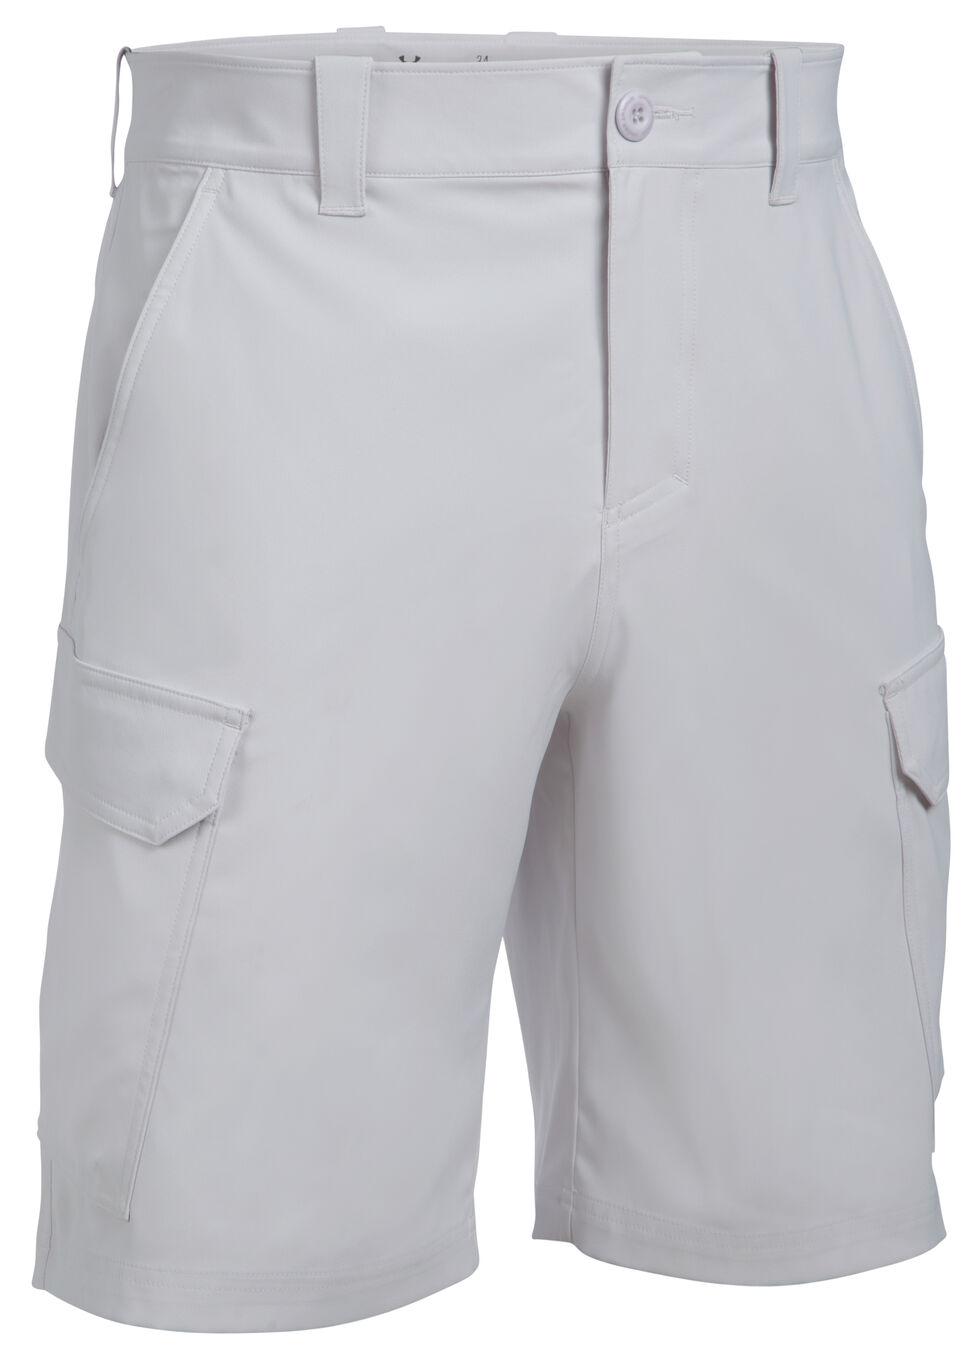 Under Armour Men's Fish Hunter Cargo Shorts, Grey, hi-res